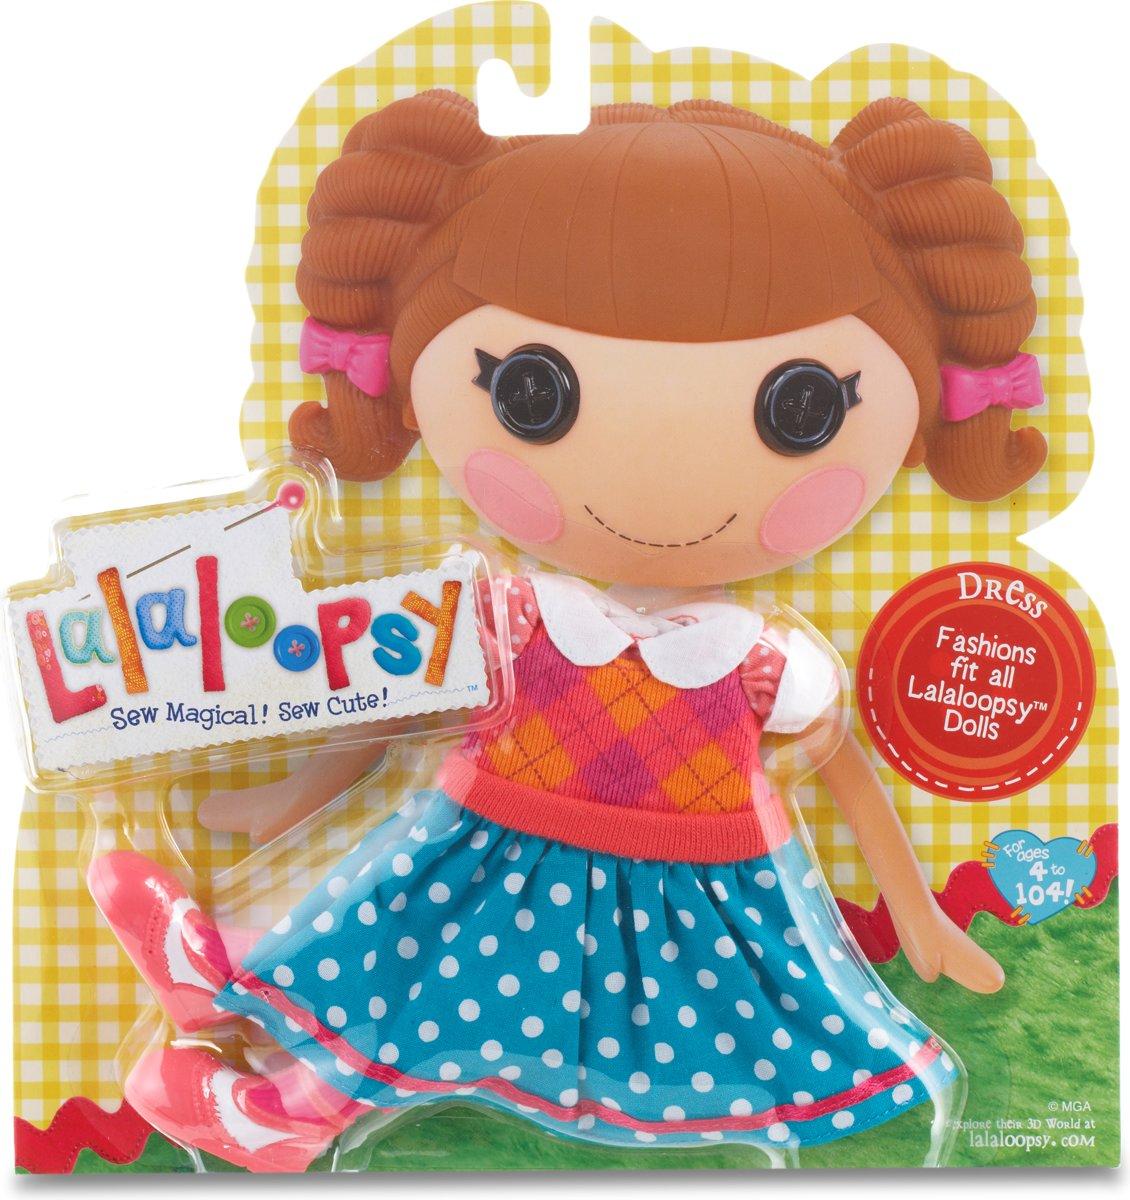 Kleding Lalaloopsy: poppenkleding jurkje met laarsjes